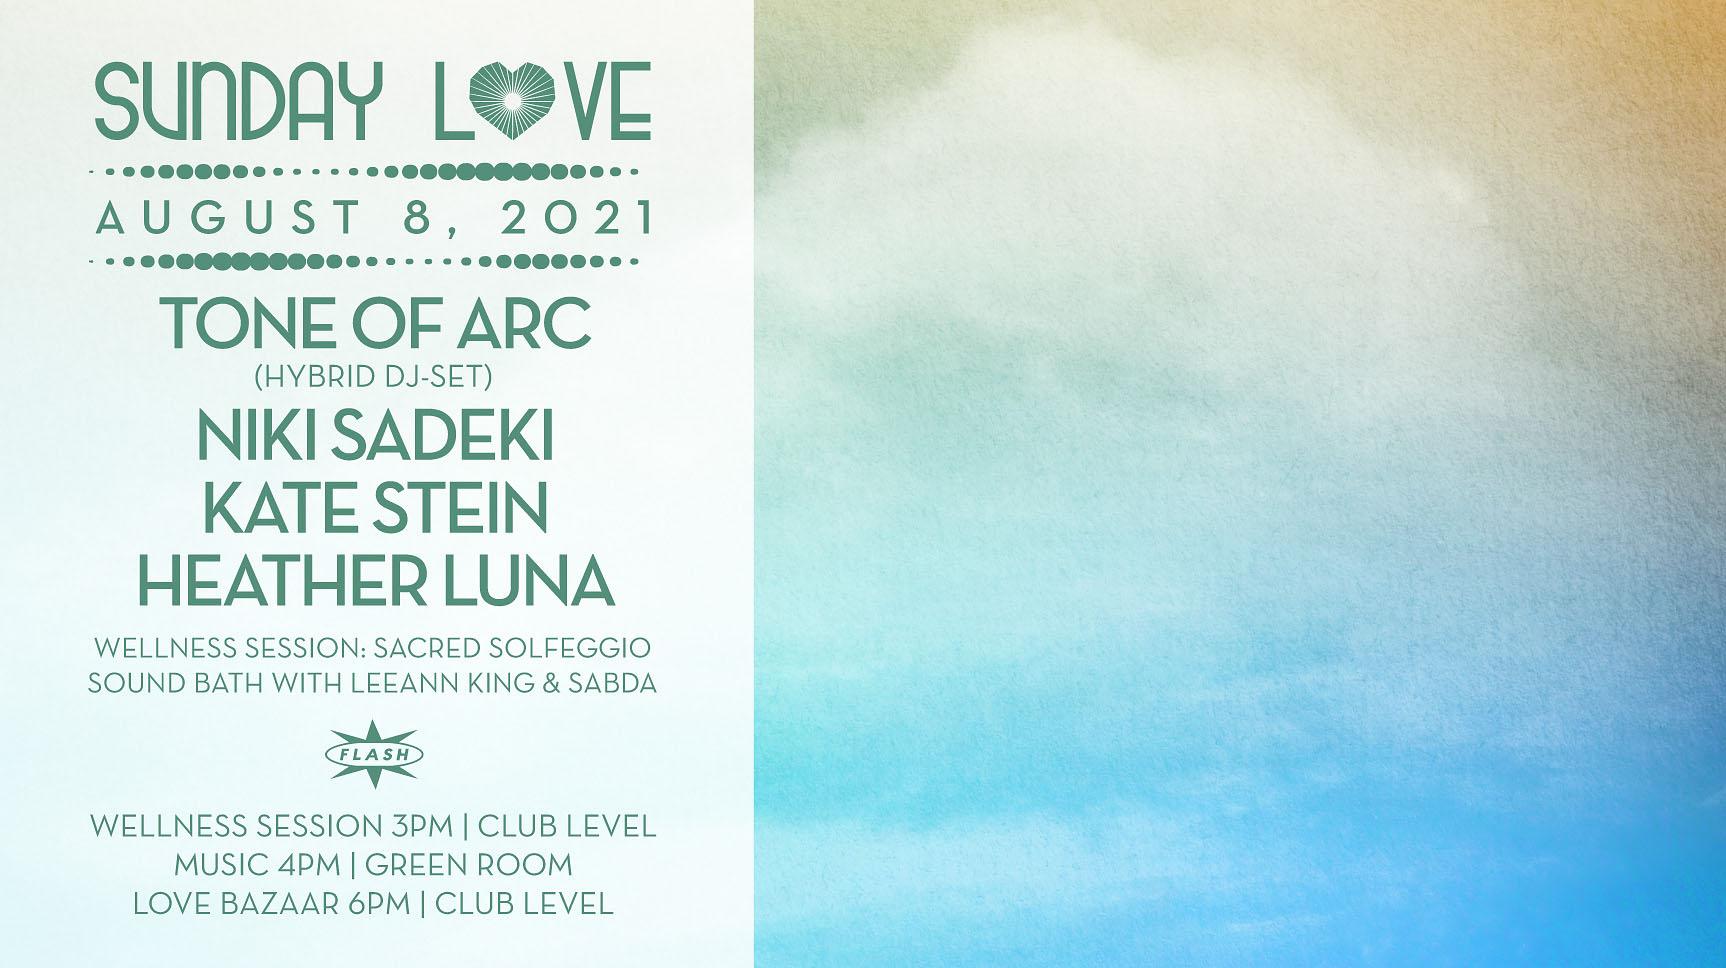 Sunday Love: Tone of Arc - Niki Sadeki - Kate Stein - Heather Luna